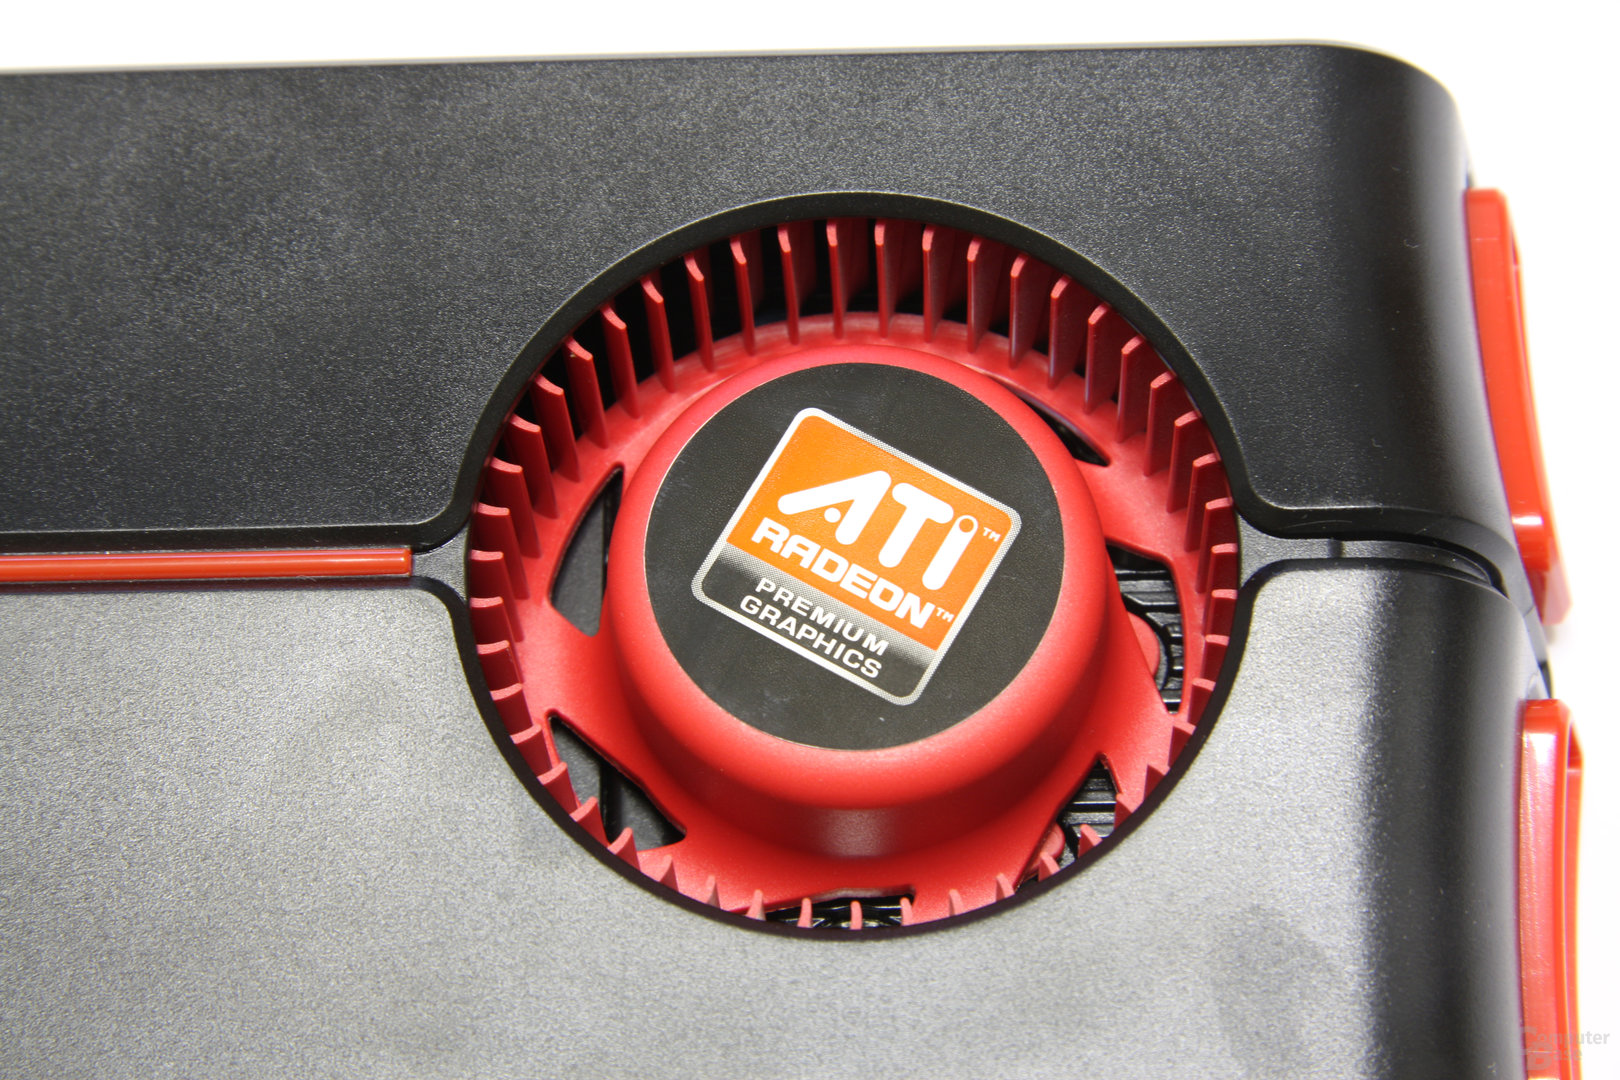 Radeon HD 5870 Lüfter